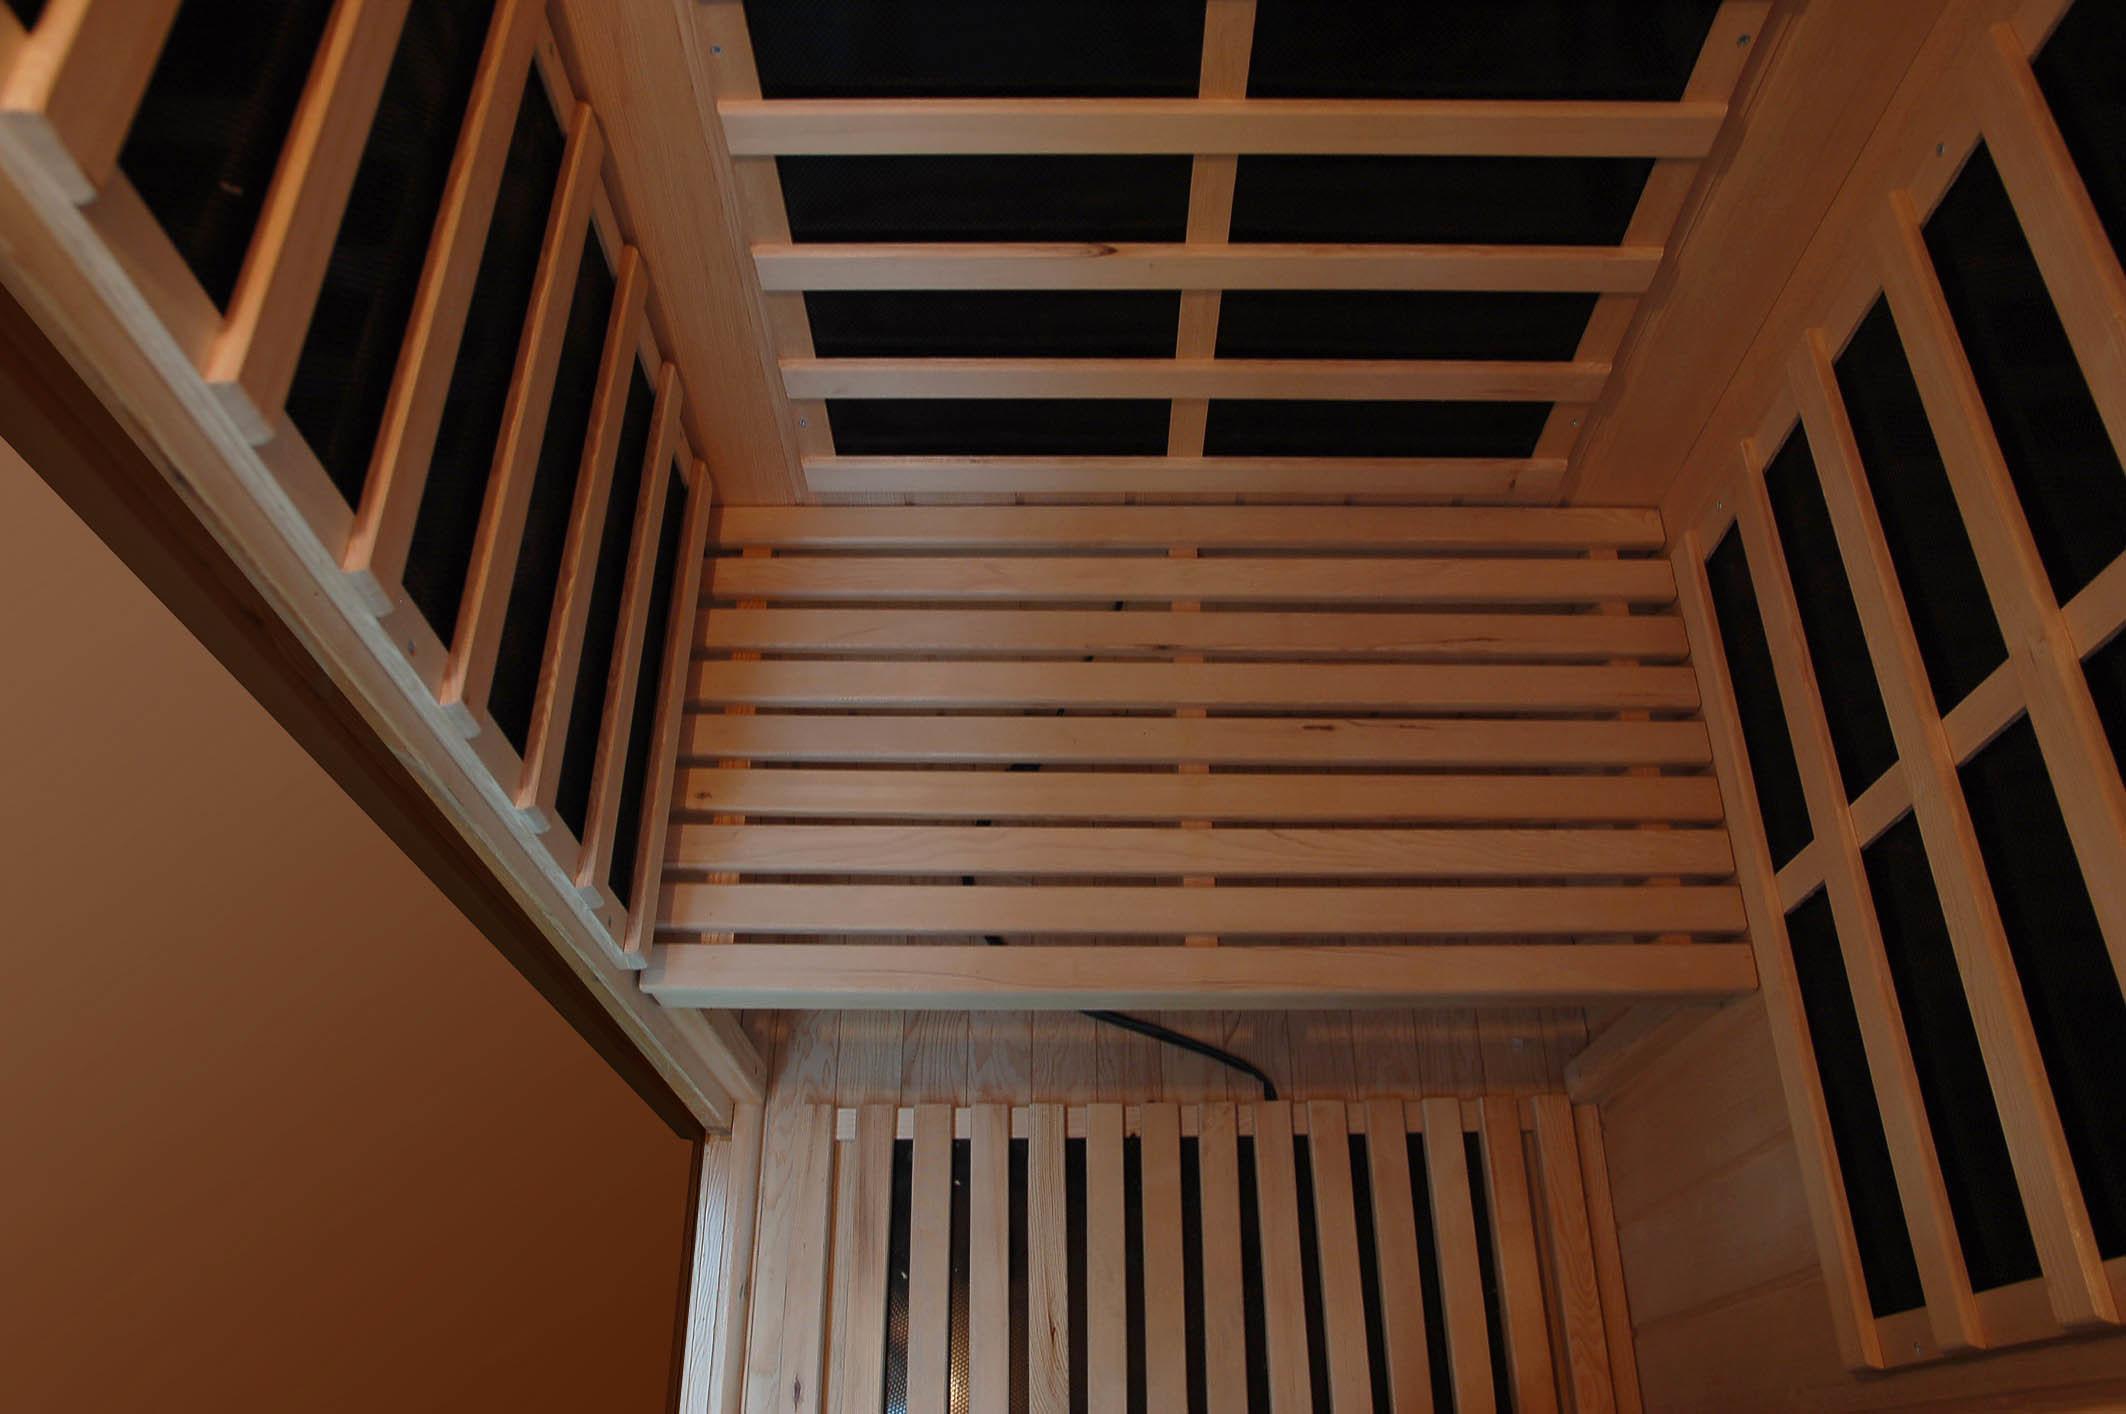 2016 New Hemlock Far Infrared Sauna Room with Carbon Heater